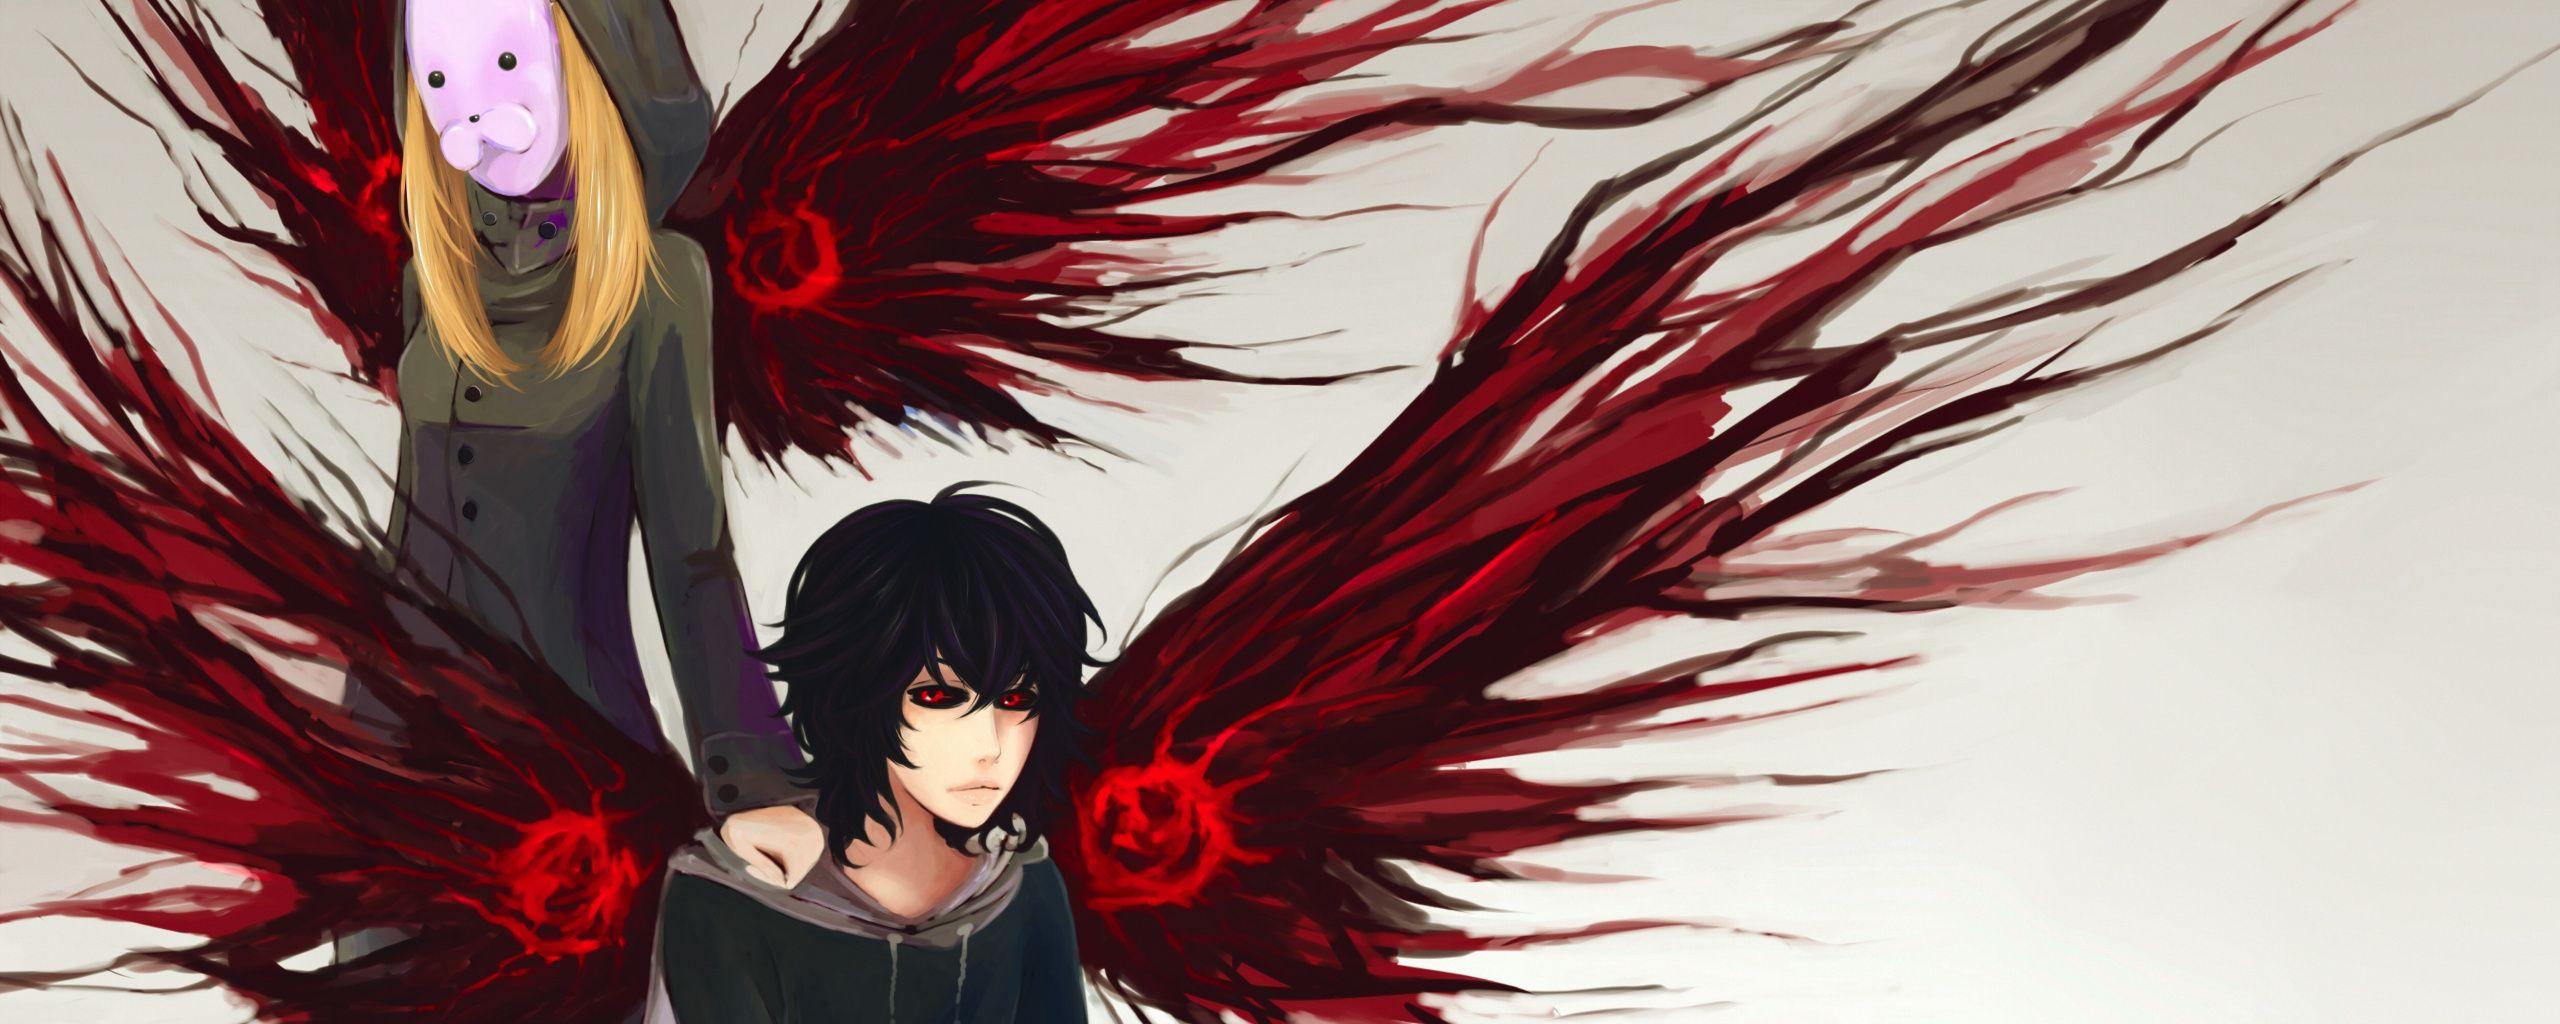 2560x1024 Wallpaper Anime Artwork Ayato Kirishima Touka